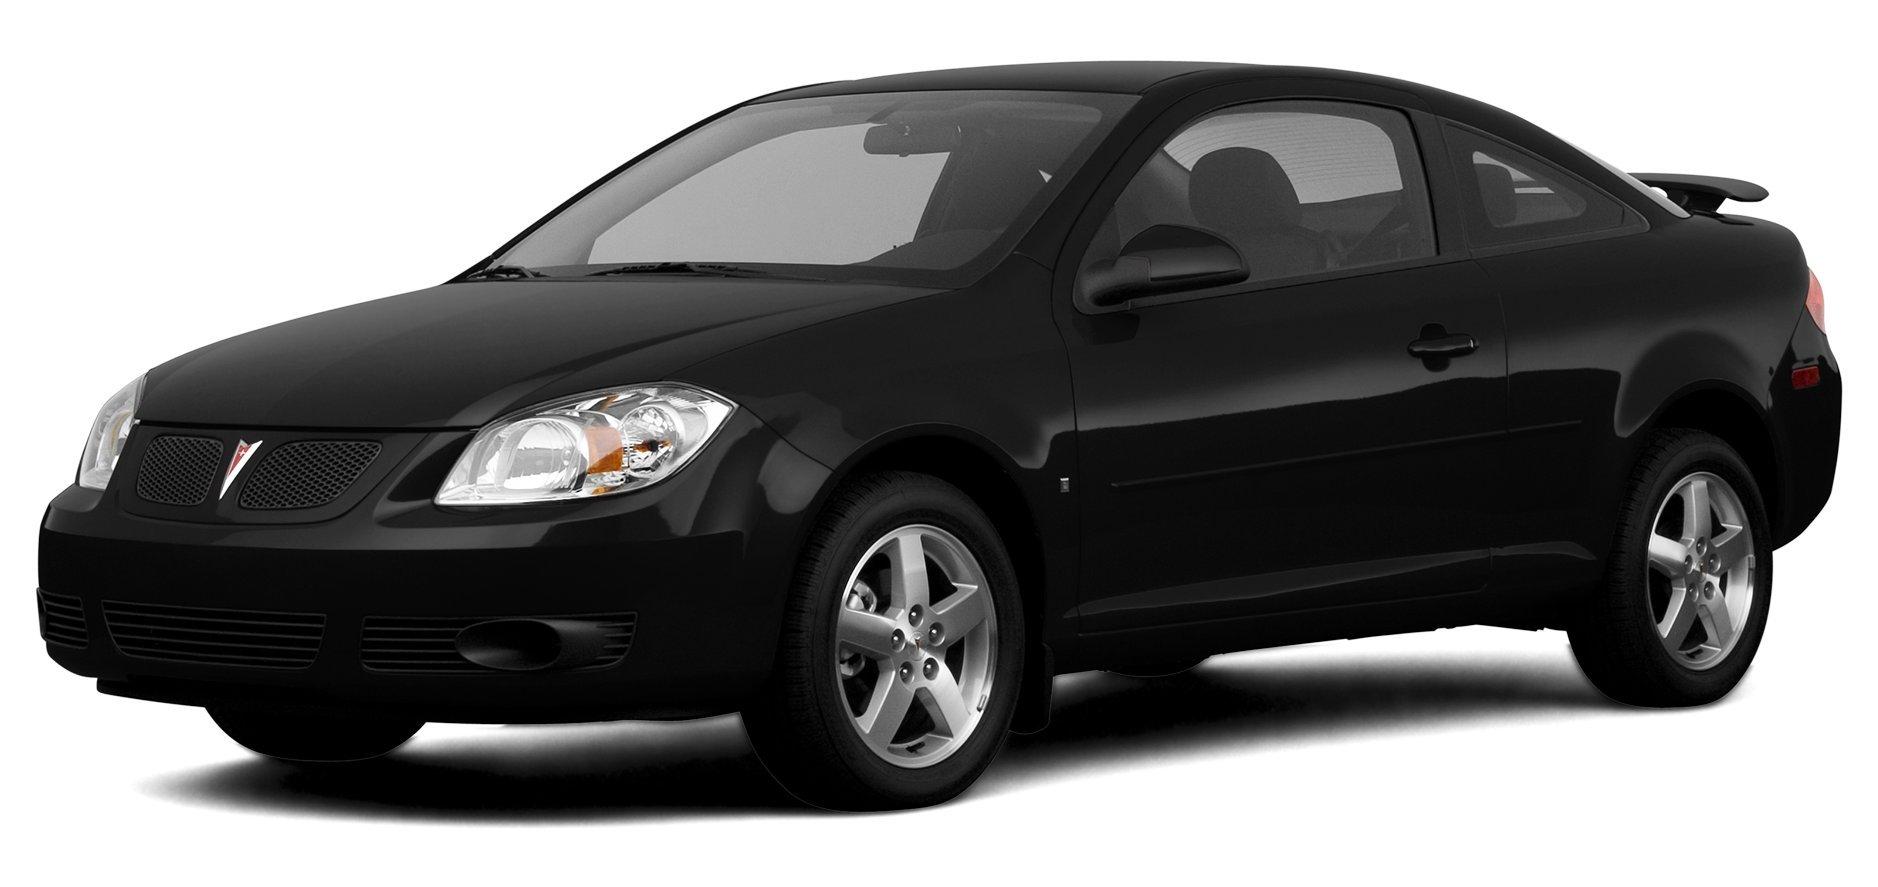 Amazon.com: 2007 Chevrolet Cobalt Reviews, Images, and Specs: Vehicles